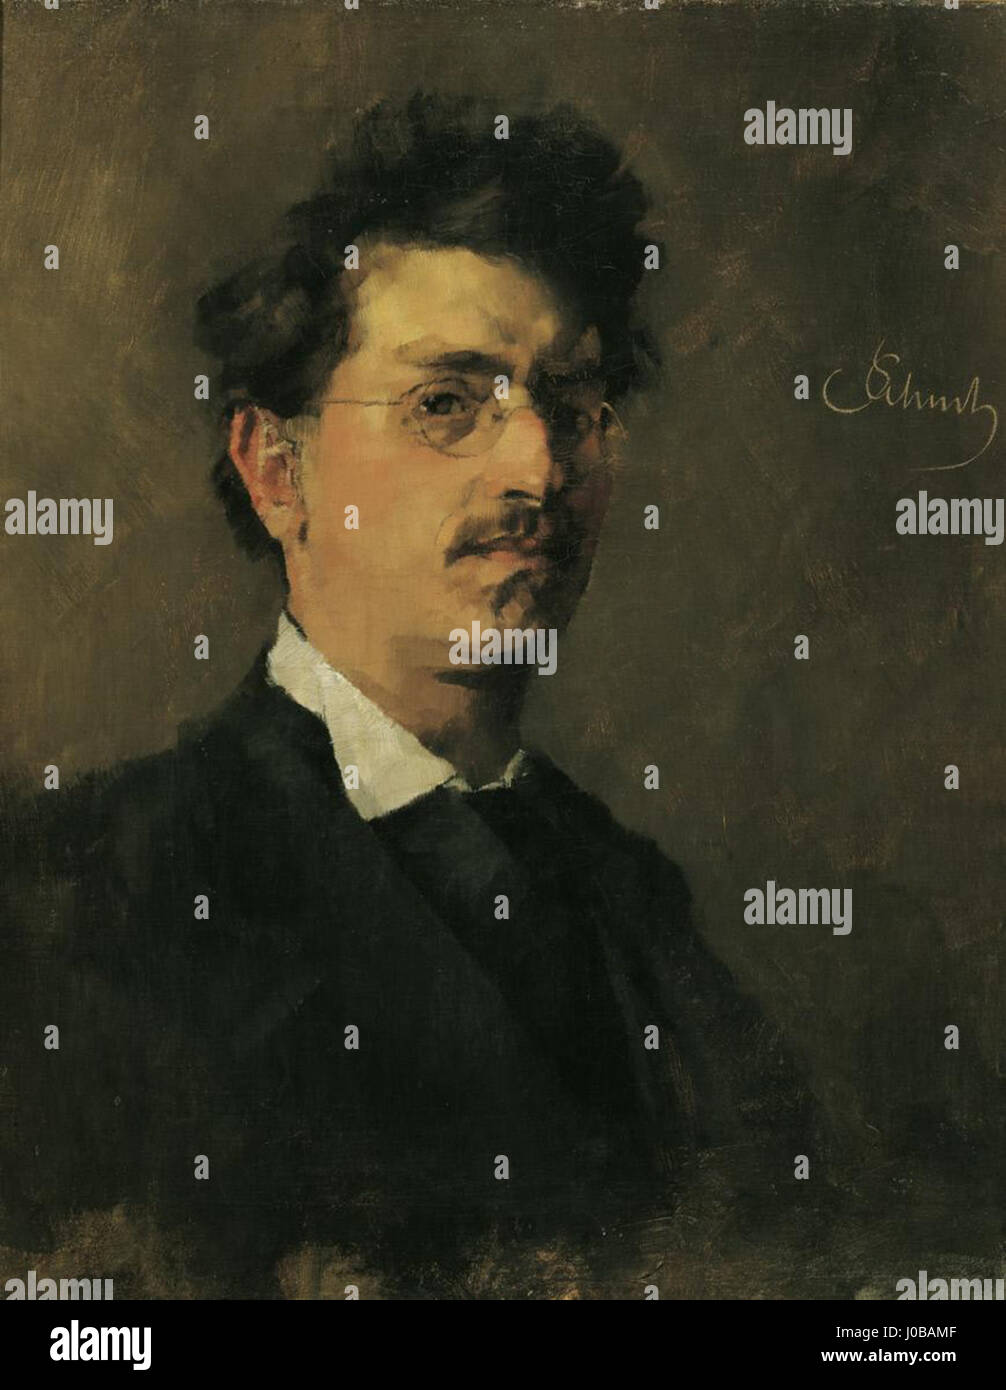 Carl Schuch, Selbstportät 1876 Stockfoto